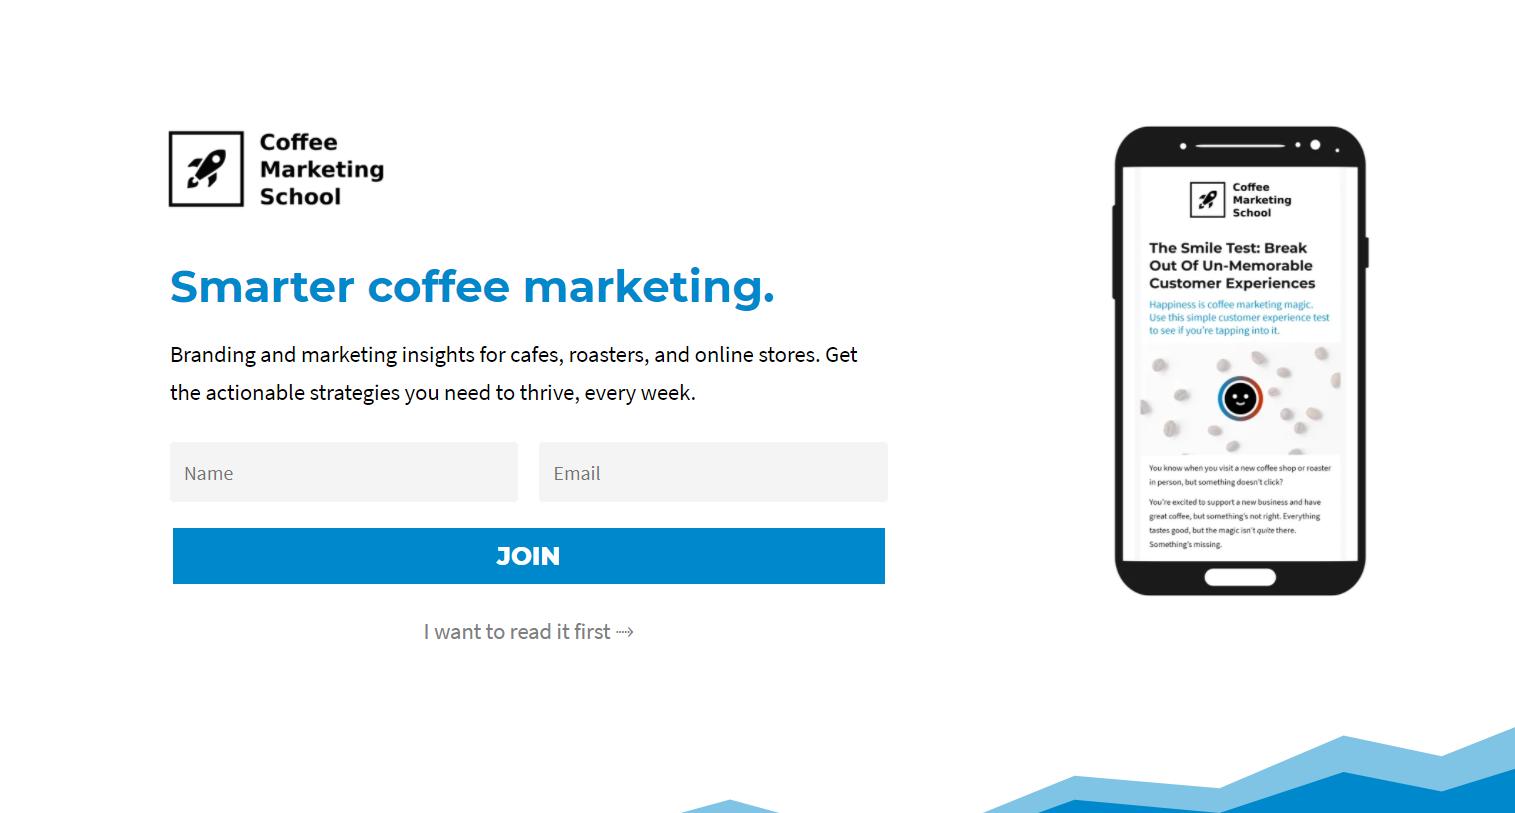 coffee marketing school